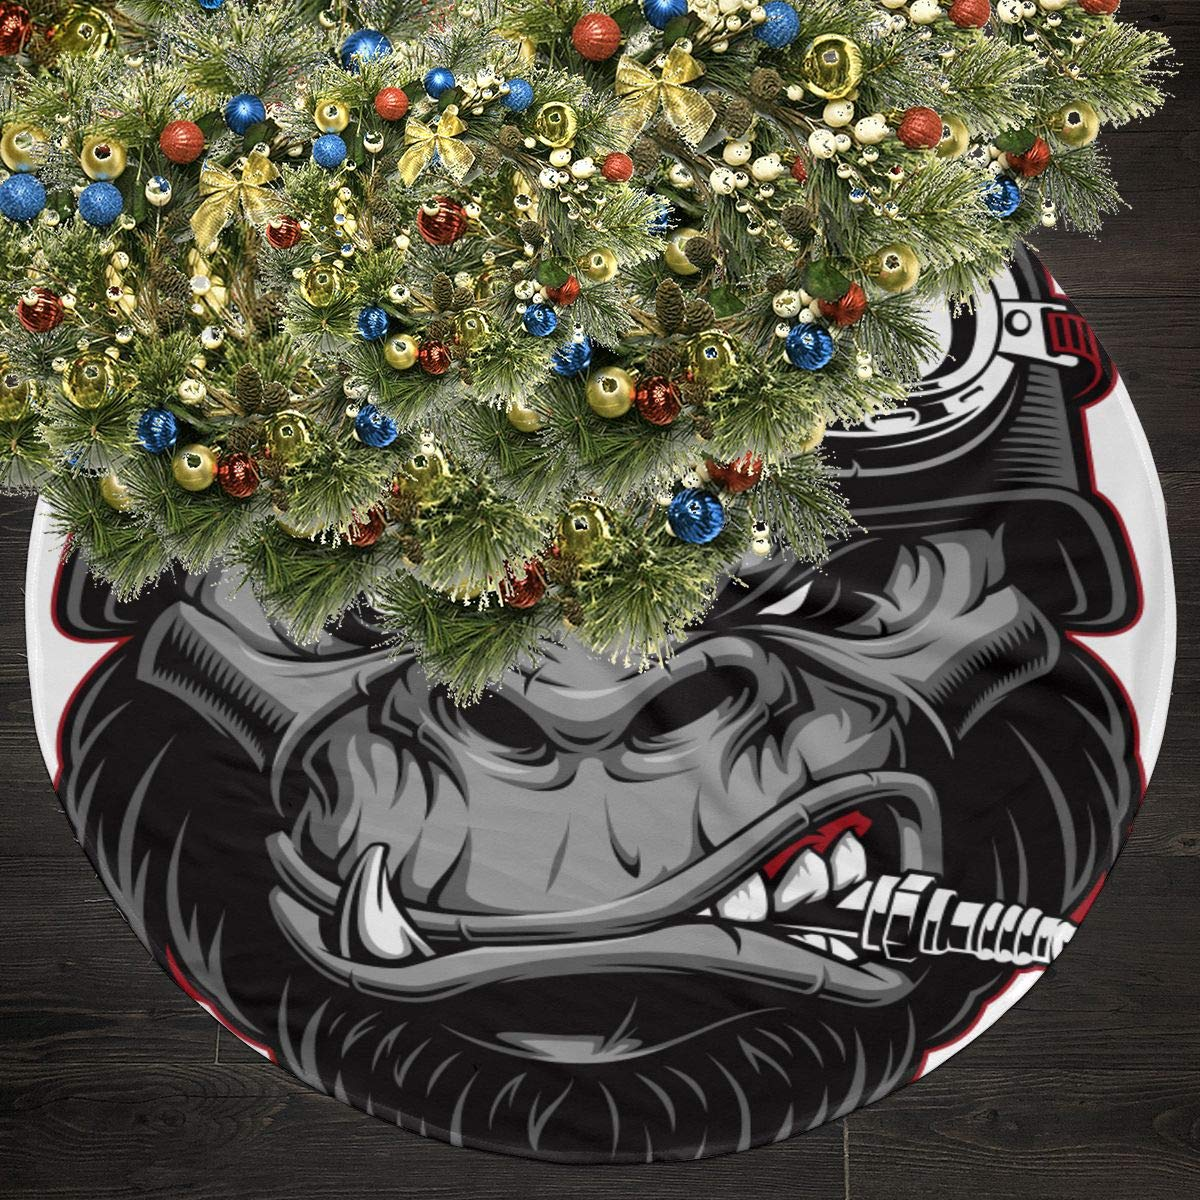 Amazon.com: FUNCOOLCY Fierce Angry Gorilla Christmas Tree ...